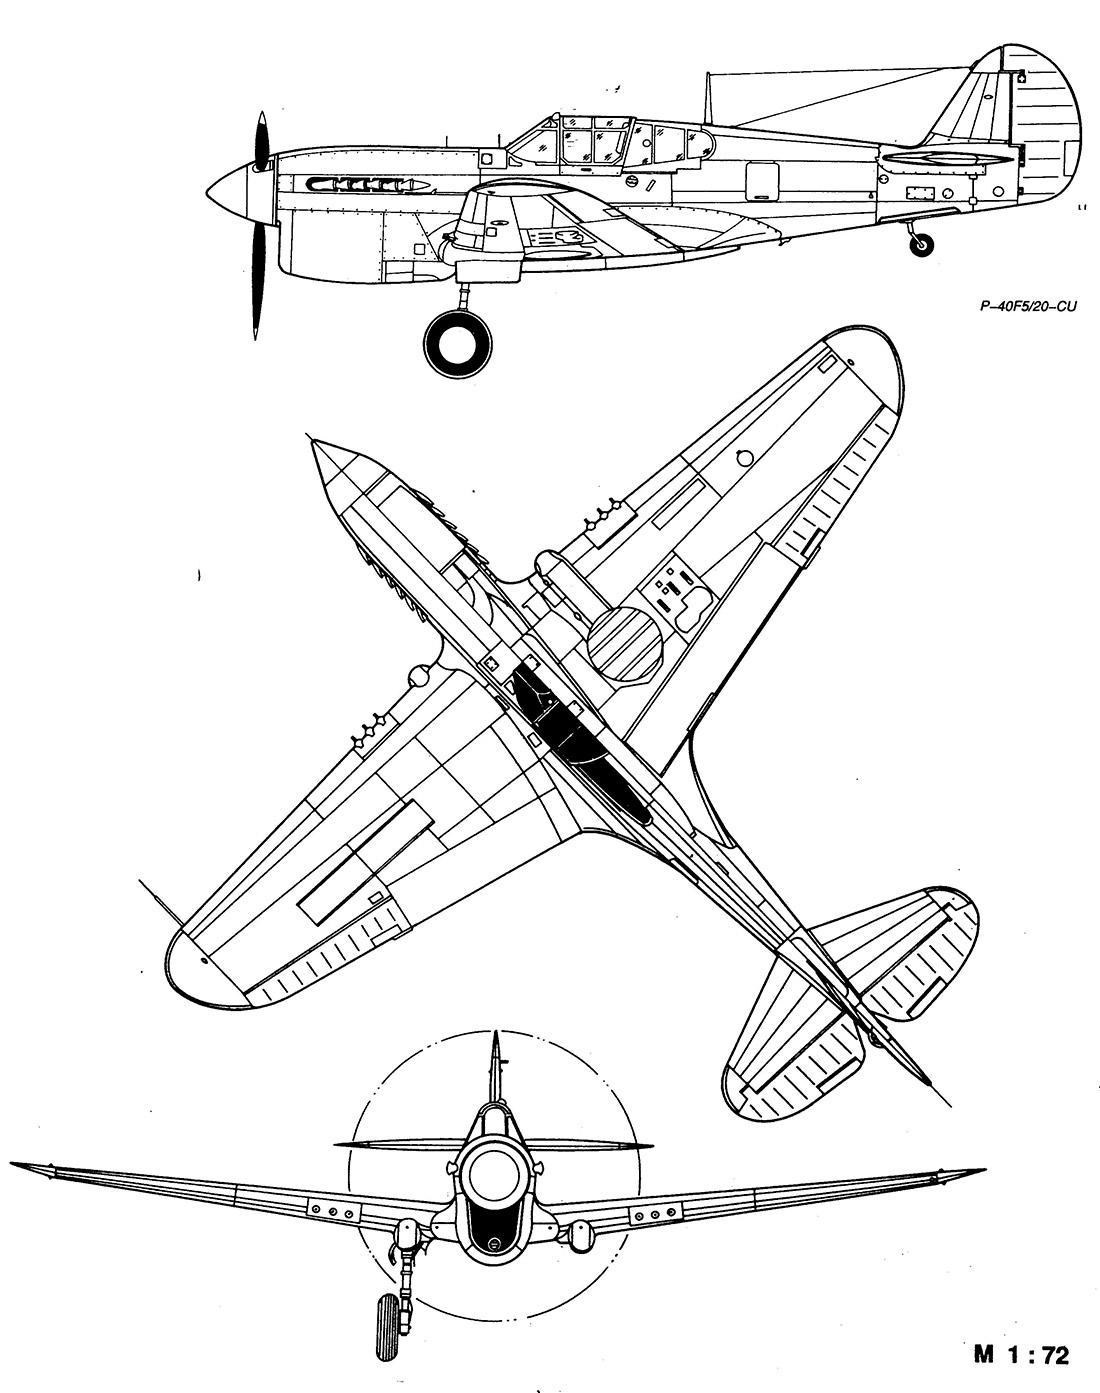 Чертеж истребителя P-40 Томагавк